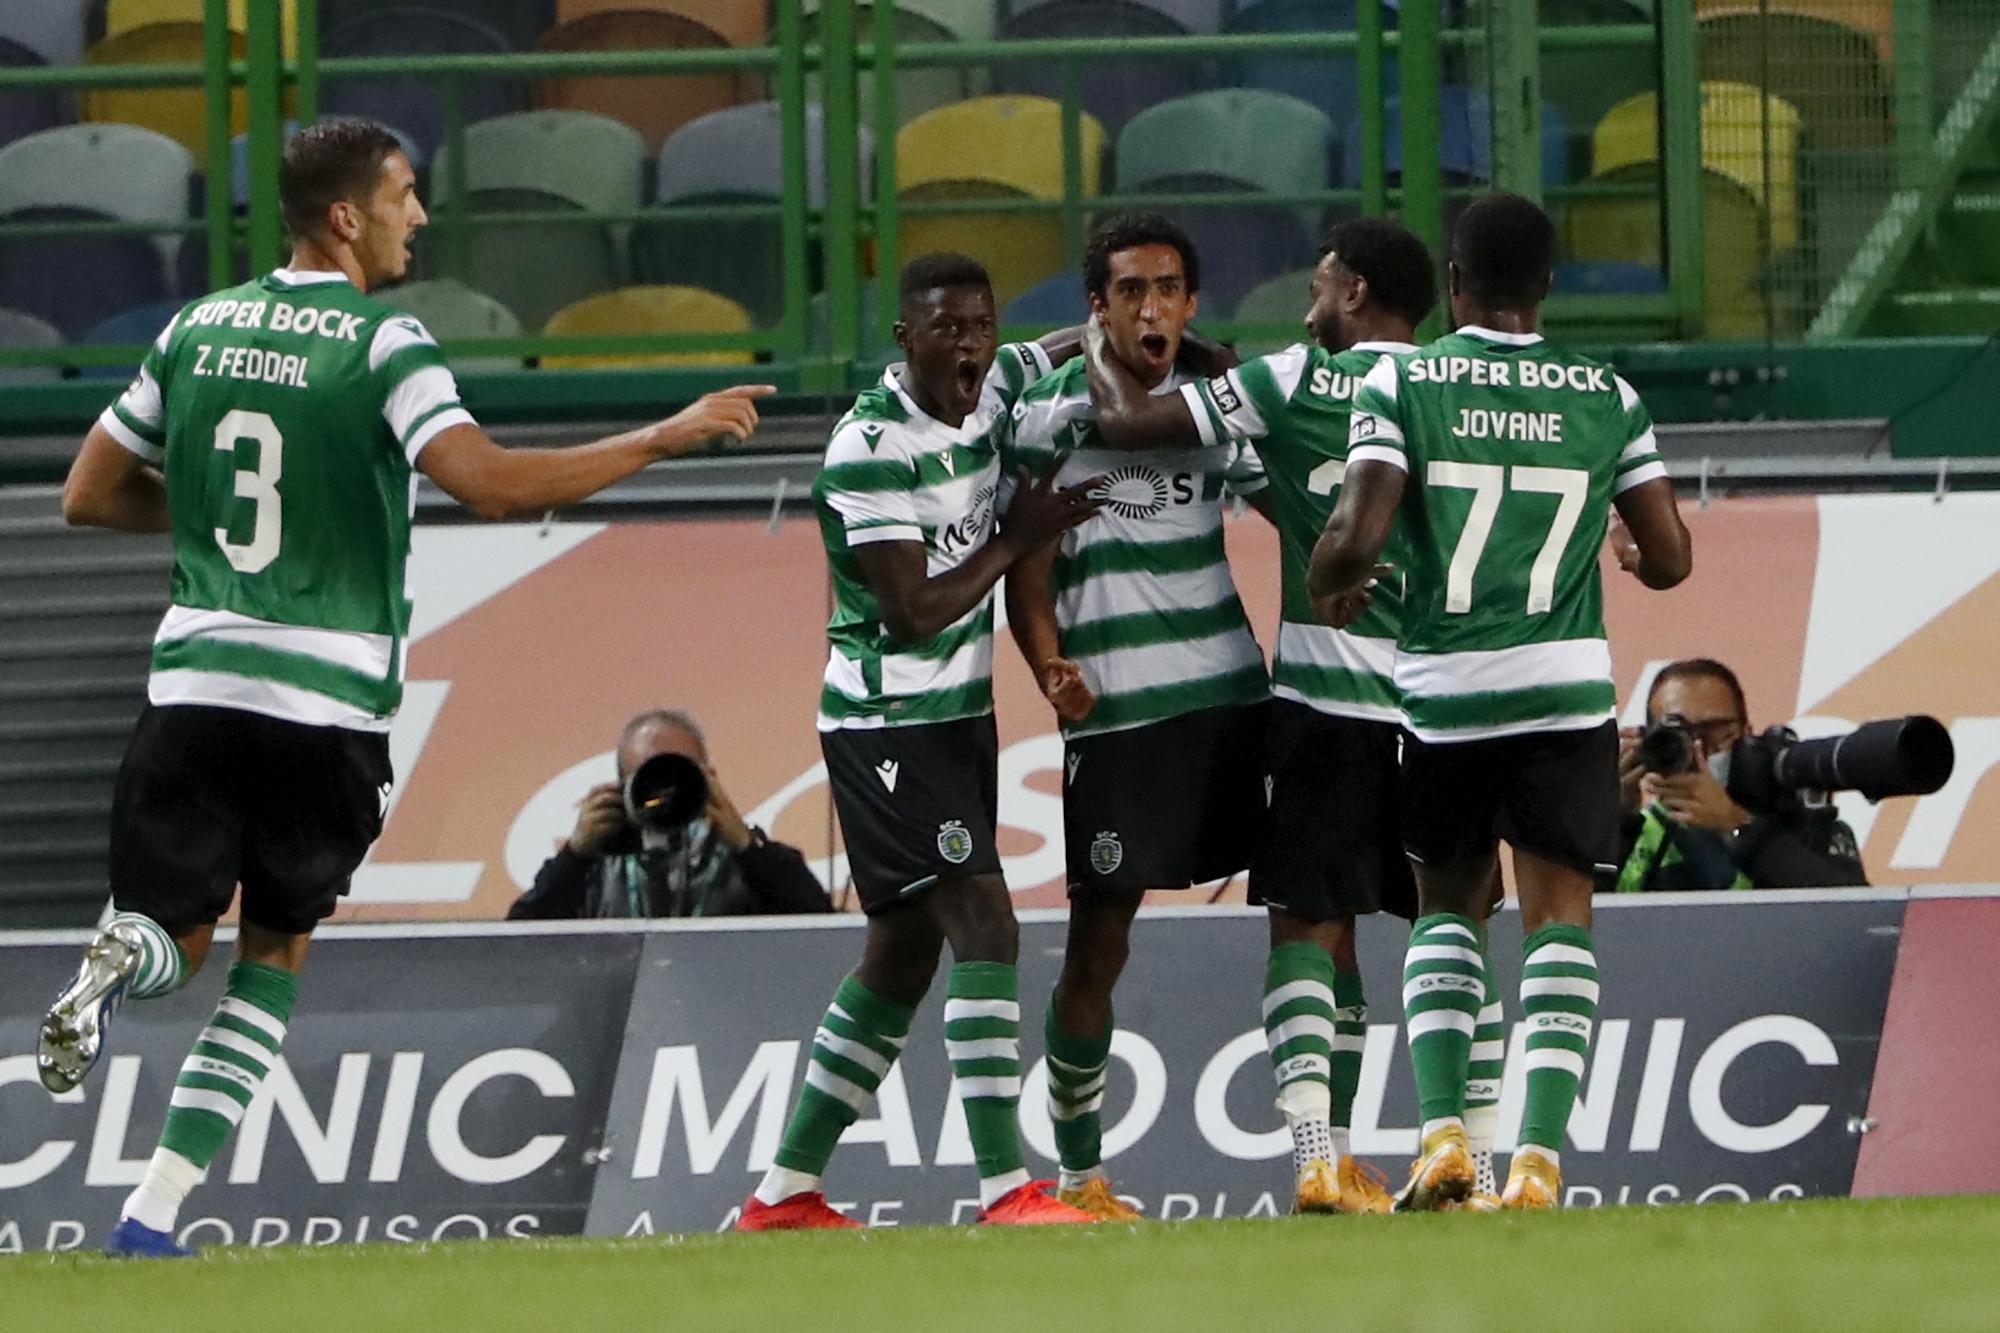 Belenenses vs. Sporting CP FREE LIVE STREAM (12/27/20): Watch Primeira Liga  online   Time, USA TV, channel - nj.com